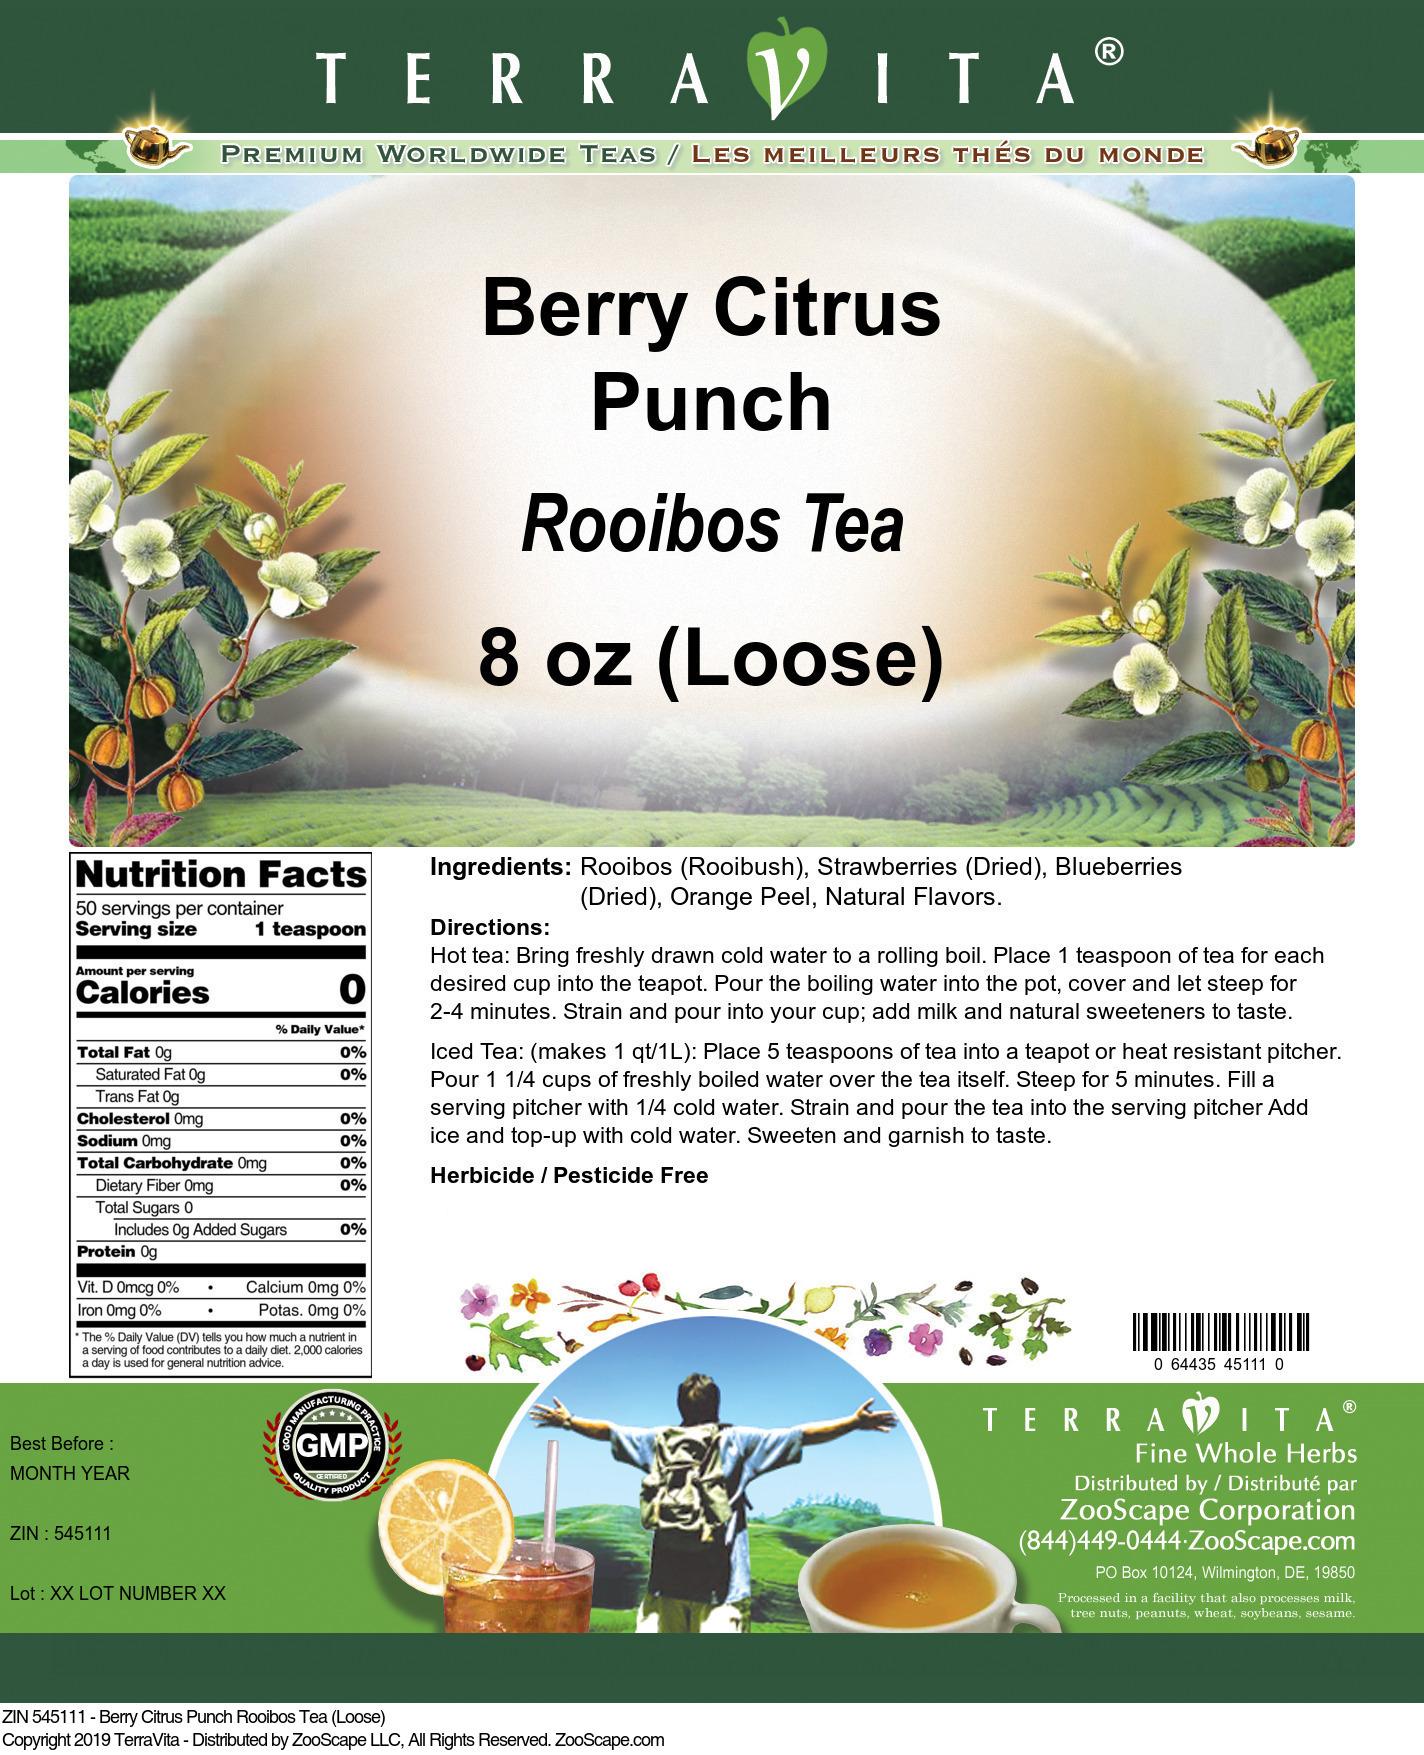 Berry Citrus Punch Rooibos Tea (Loose)